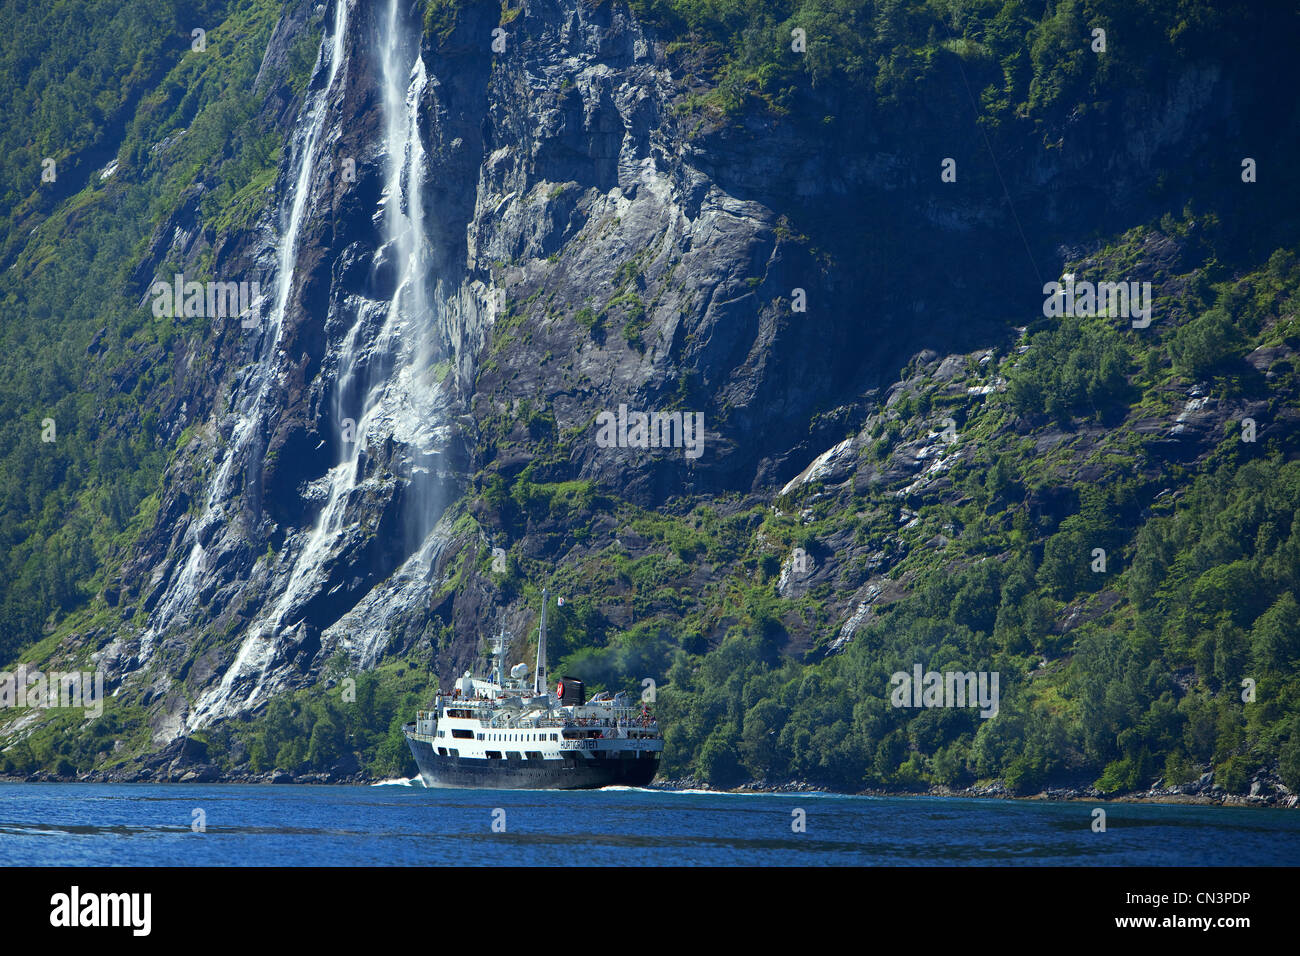 Norway, Sunnmore Region, More og Romsdal County, Geirangerfjord listed as World Heritage by UNESCO, MS Lofoten Hurtigruten - Stock Image